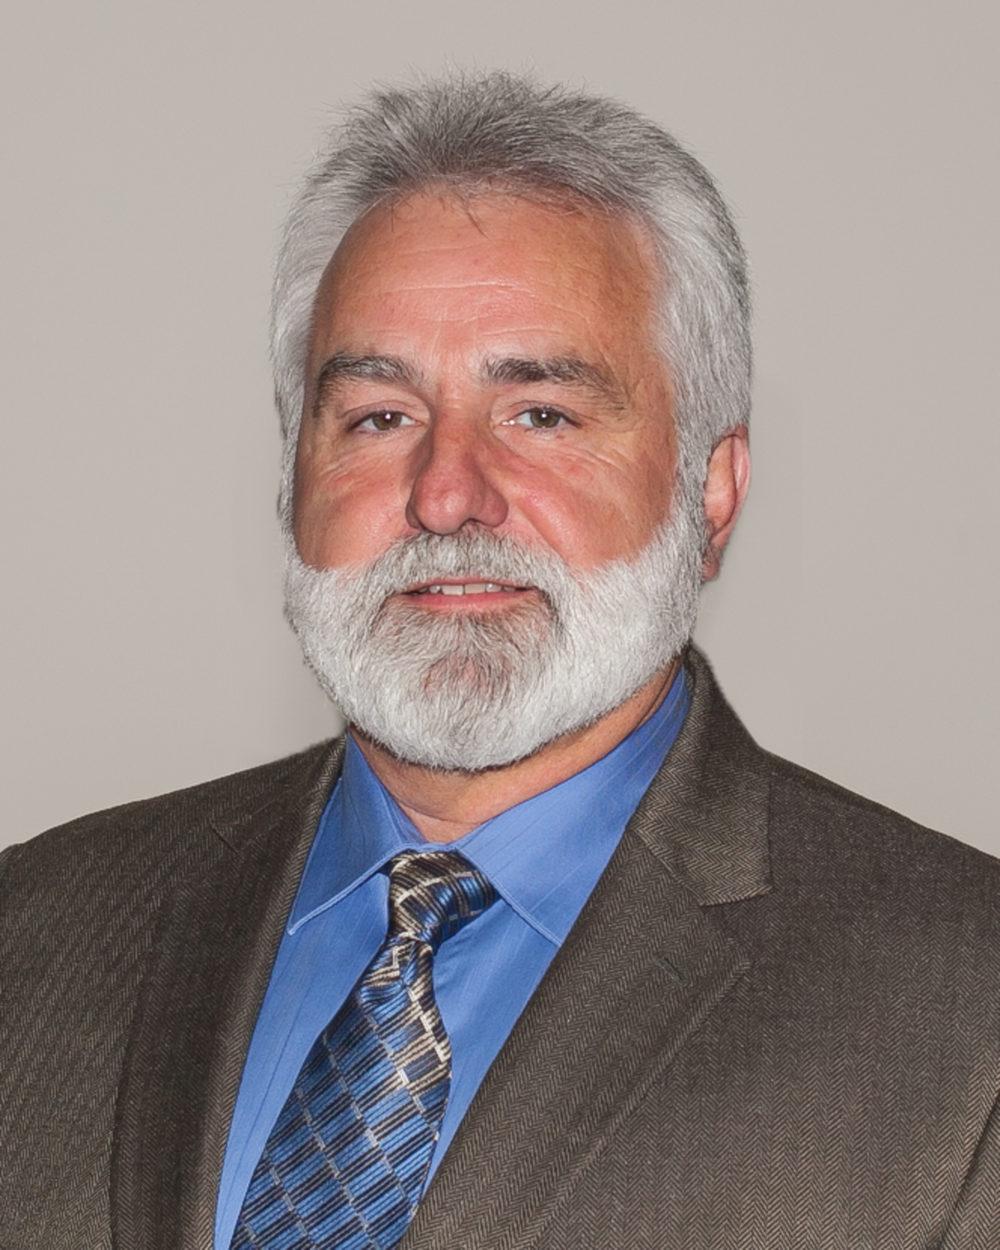 <b>Jeff Stowe </b>